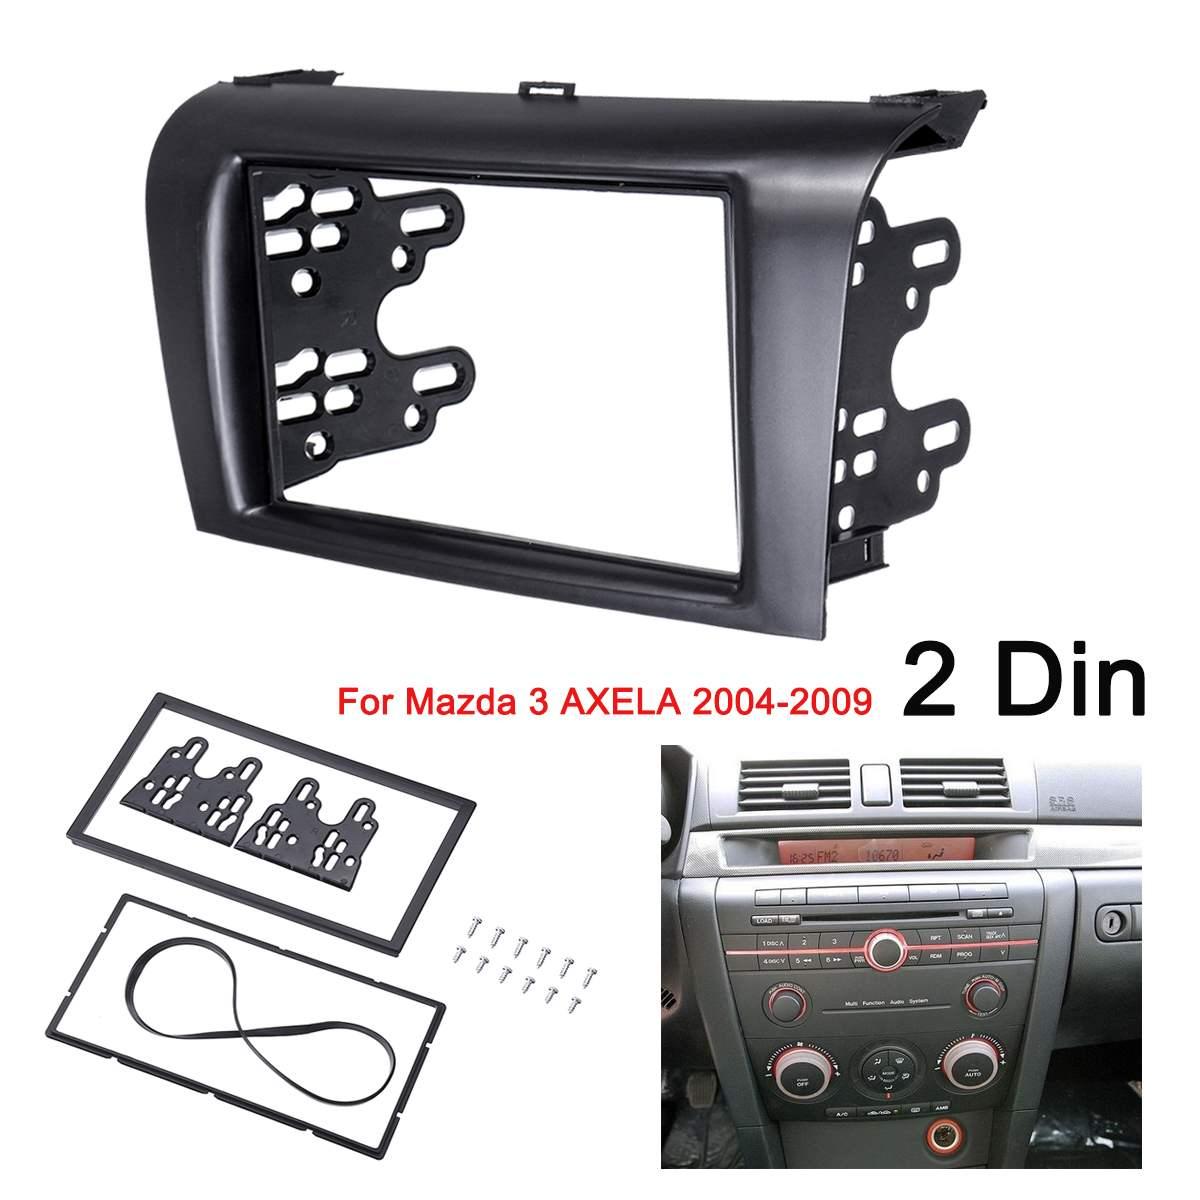 2DIN Car Stereo Radio DVD Fascia Fascias Dash Panel Plate Trim Kit Frame Cover For Mazda 3 AXELA 2004 2005 2006 2007 2008 2009